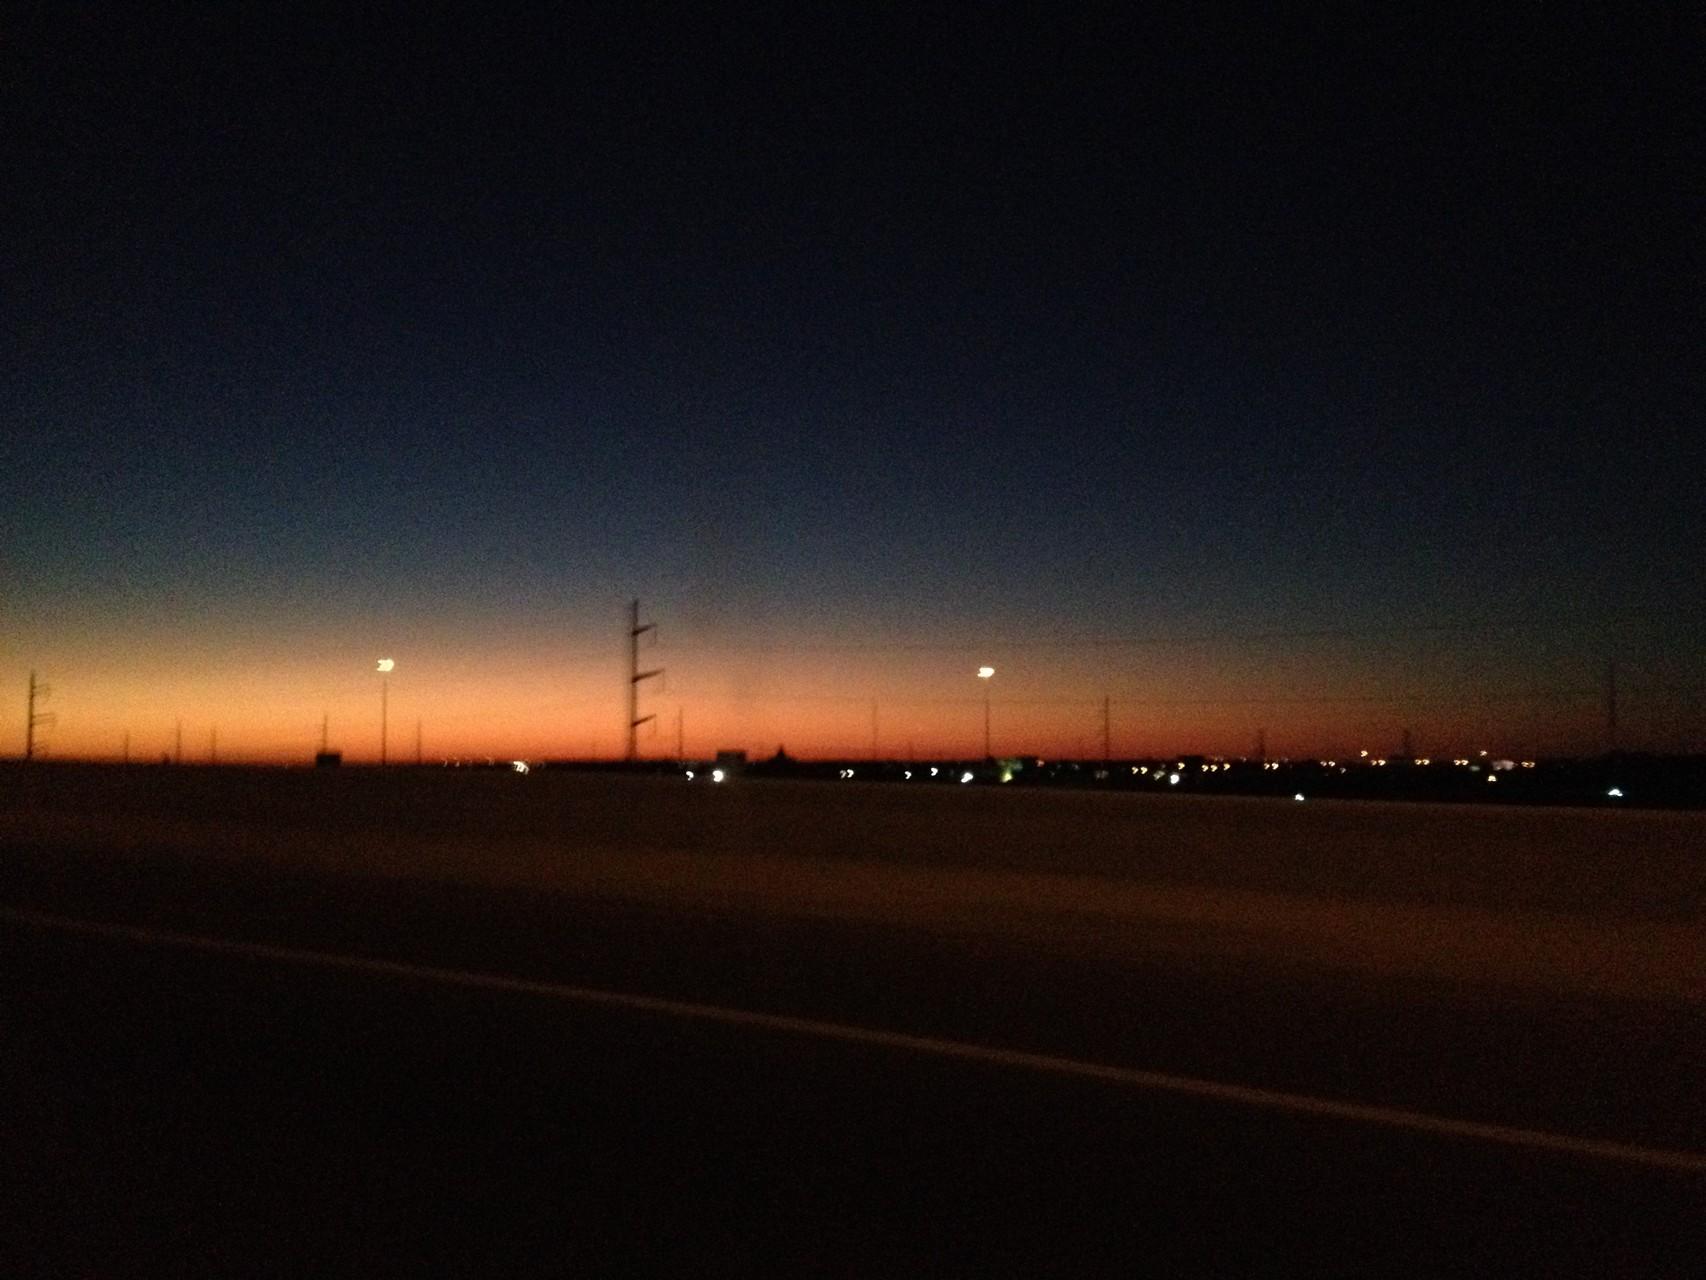 Sonnenaufgang in Texas